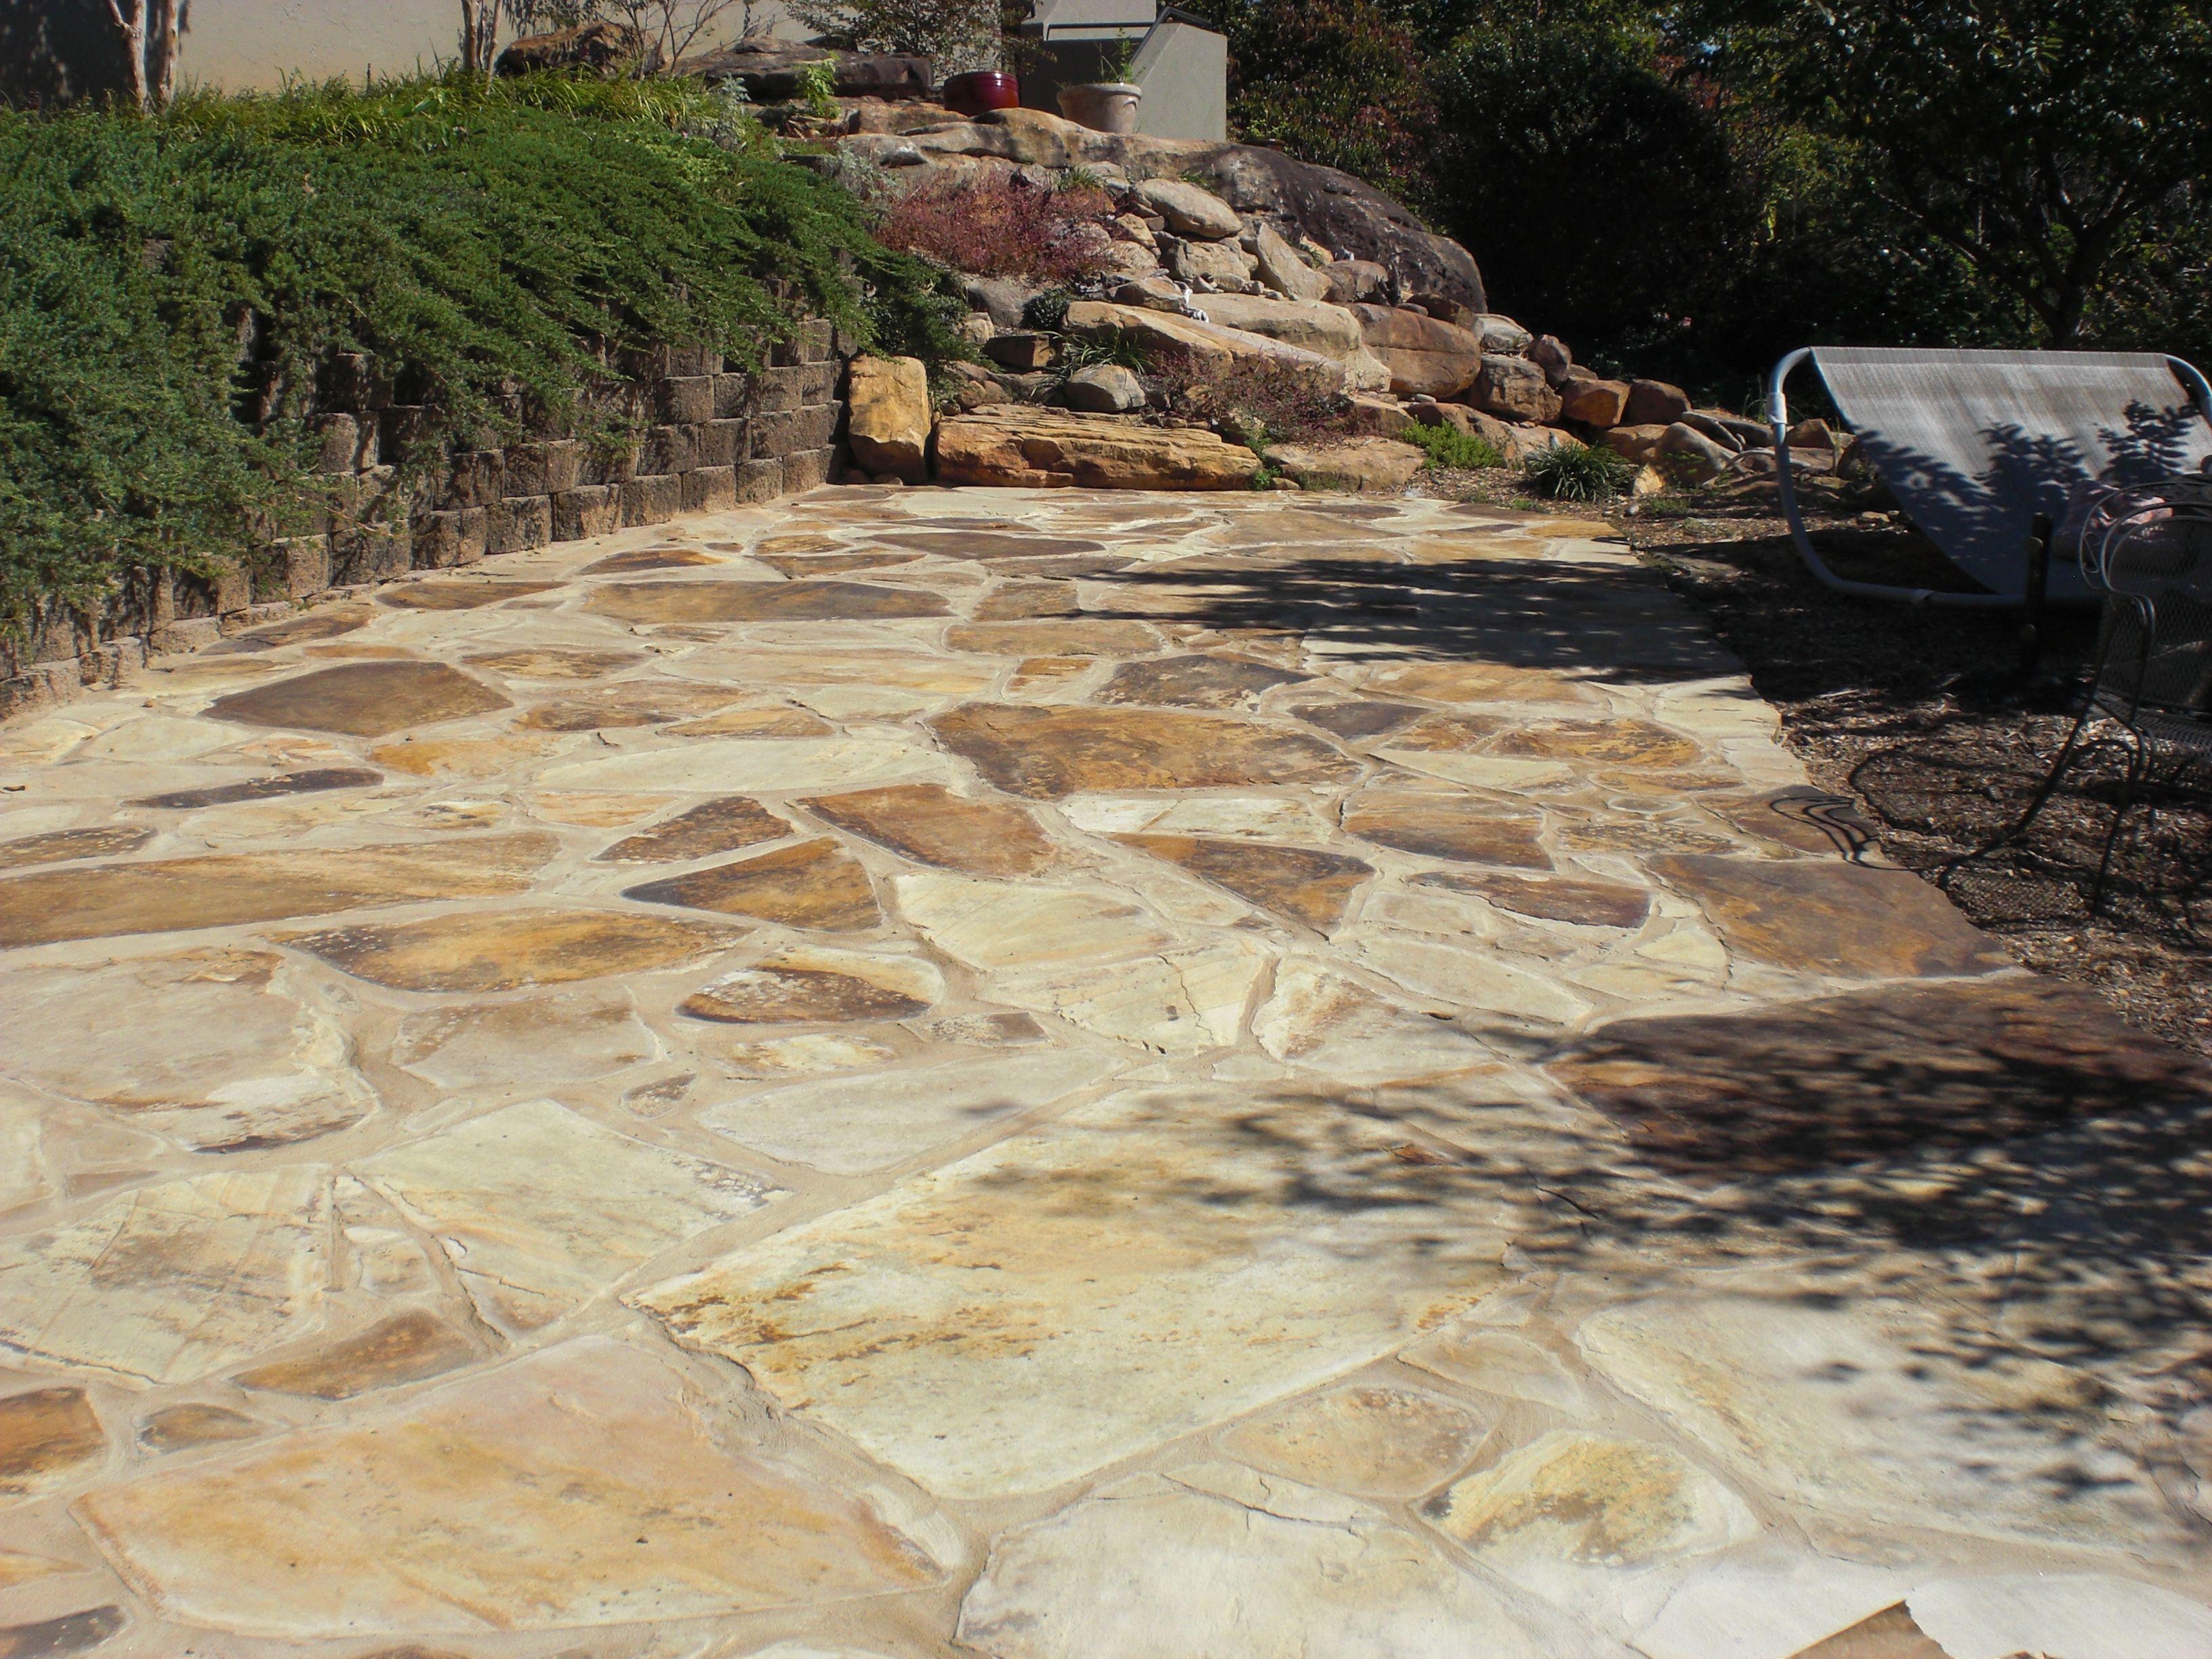 Flagstone Makes A Beautiful Surface For Patios, Walkways, Pool Decks Etc;  However,